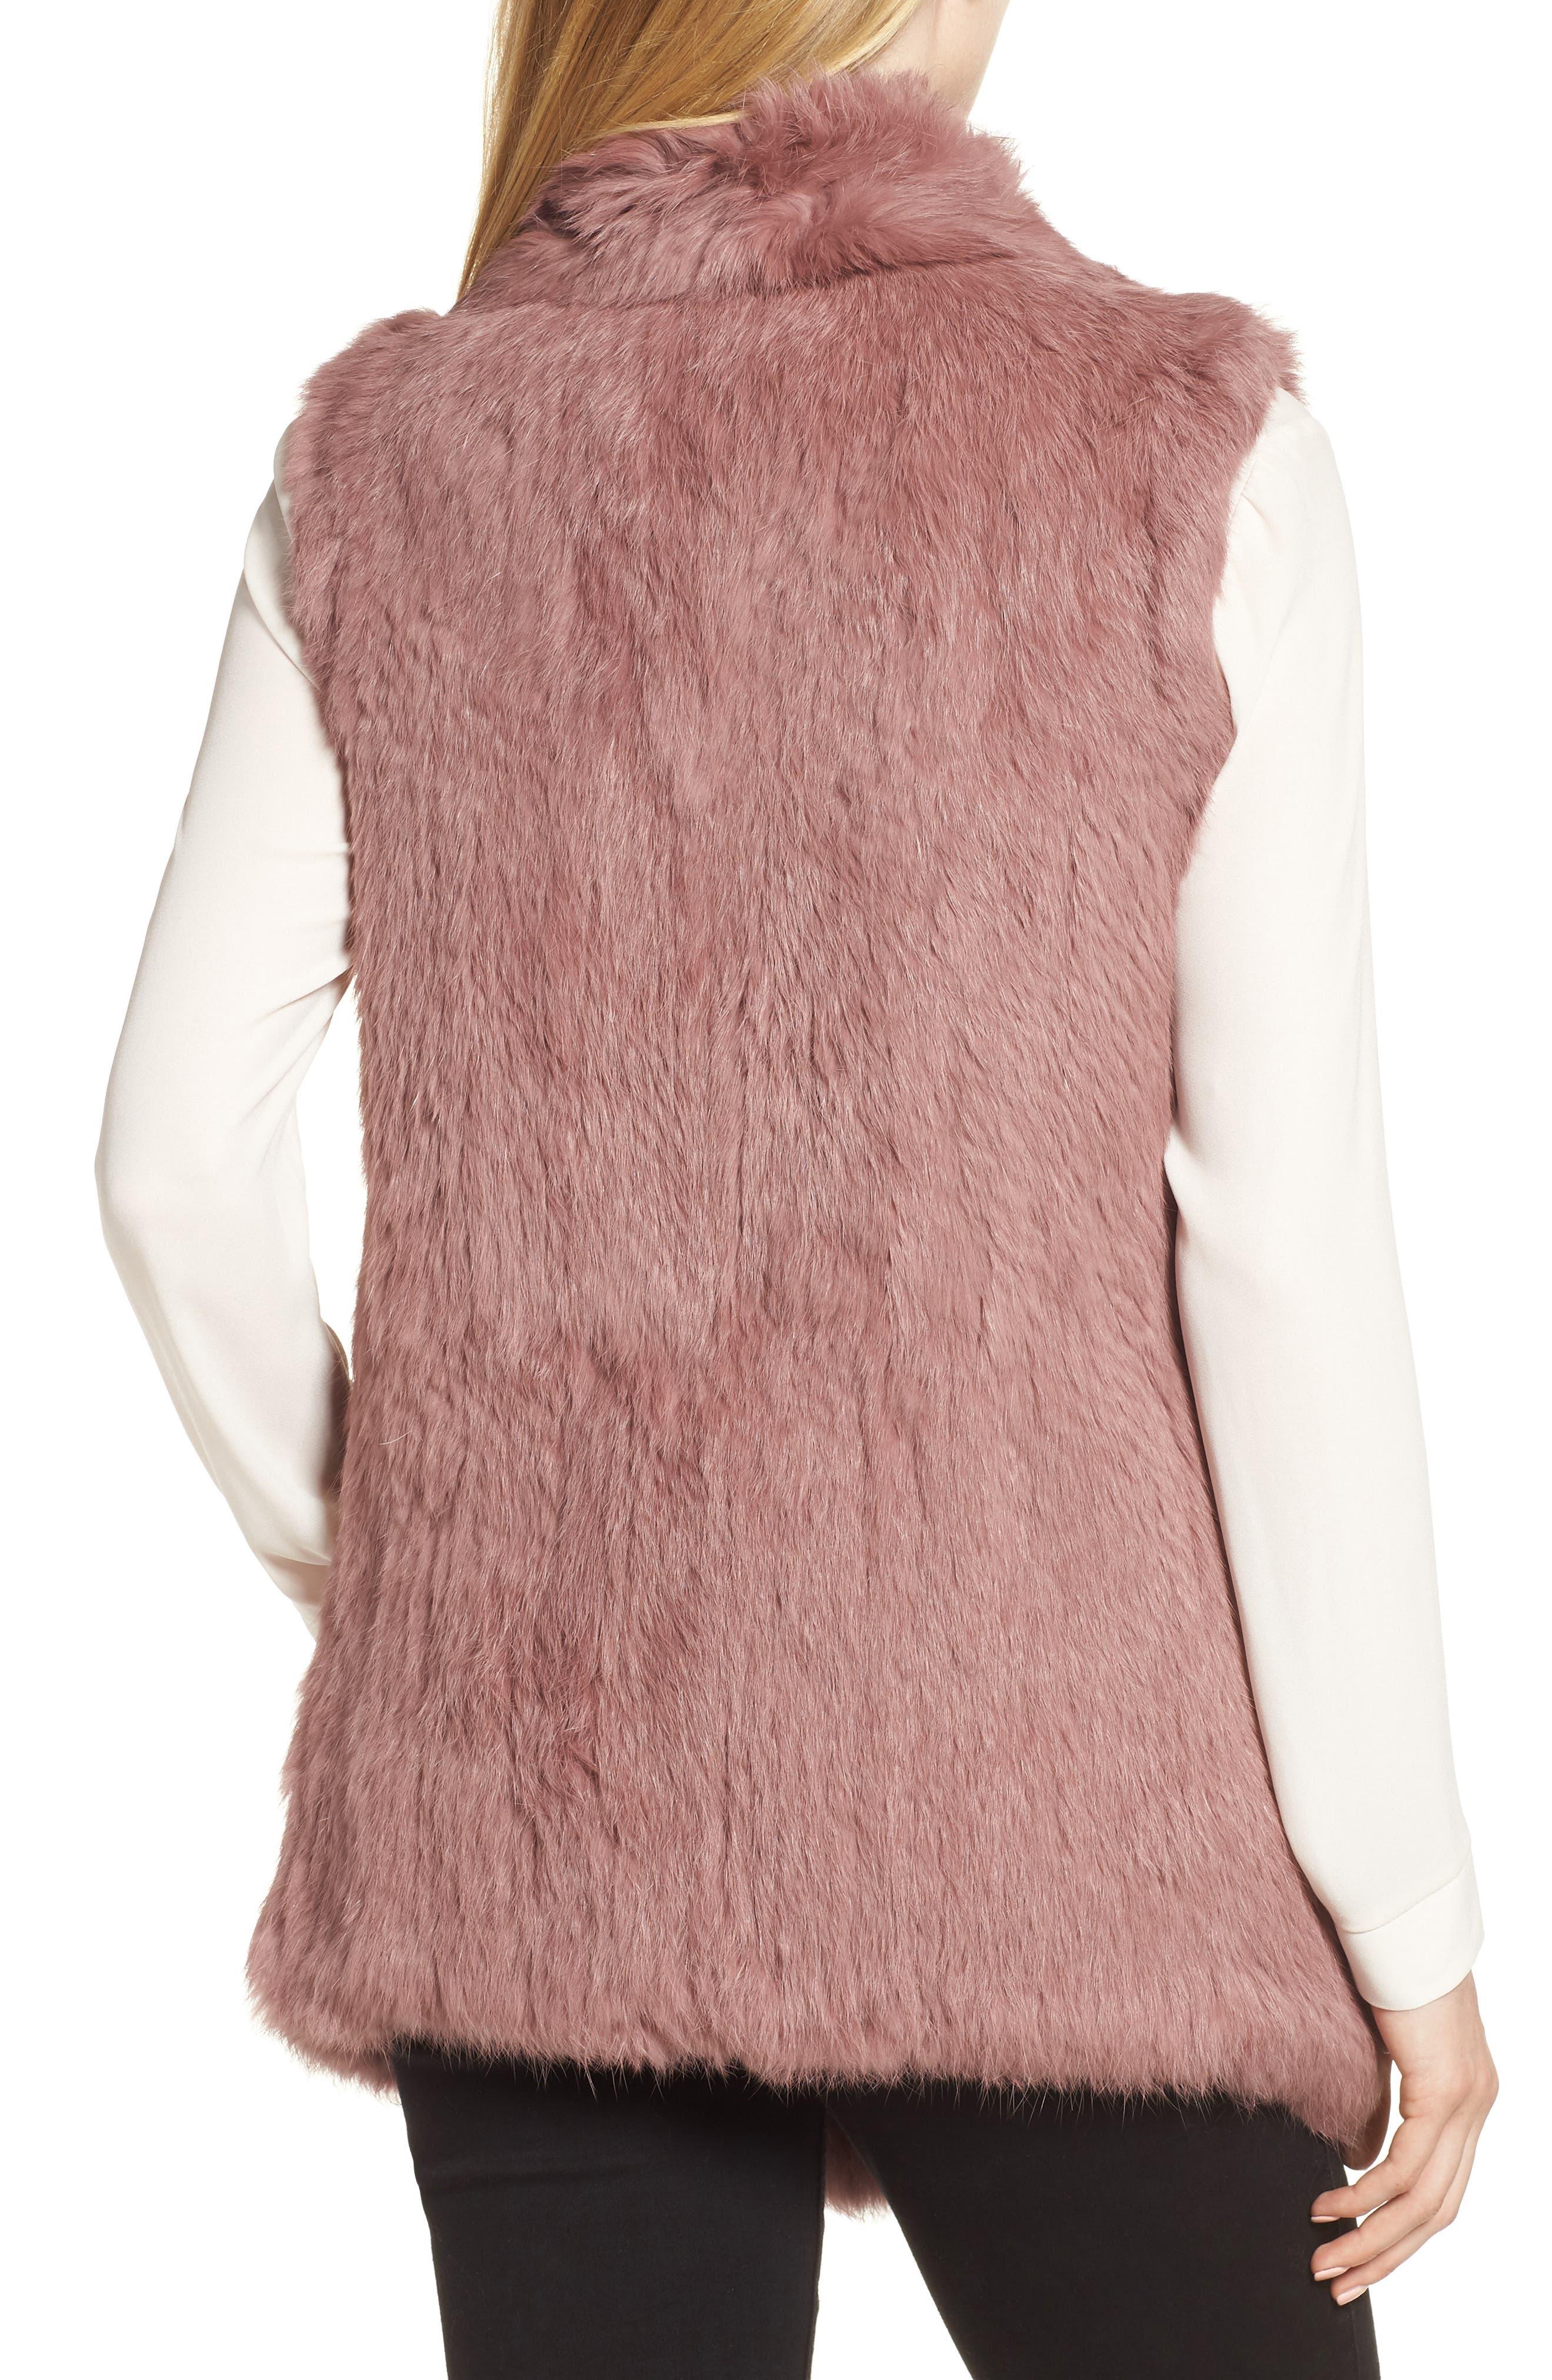 Long Drape Genuine Rabbit Fur Vest,                             Alternate thumbnail 2, color,                             Rose